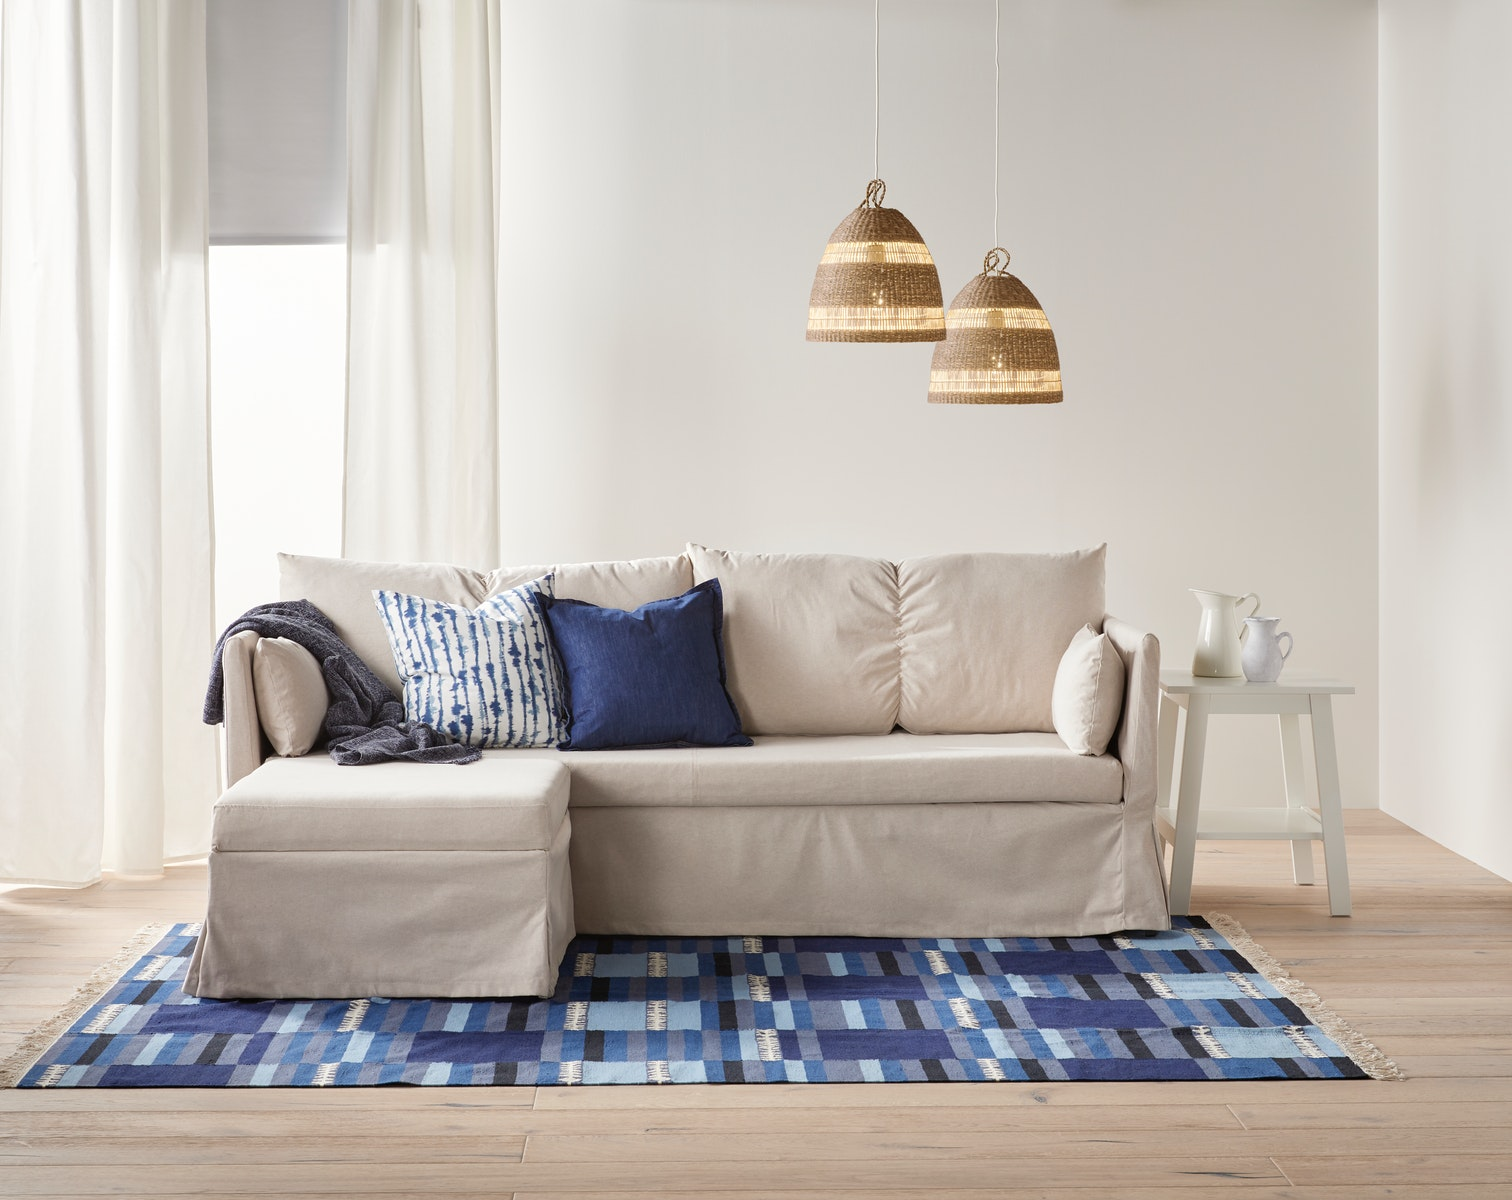 7 Pilihan Sofa Ruang Tamu Kecil Agar Ruangan Terasa Lebih Luas Ikea Indonesia Sofa ruang tamu kecil